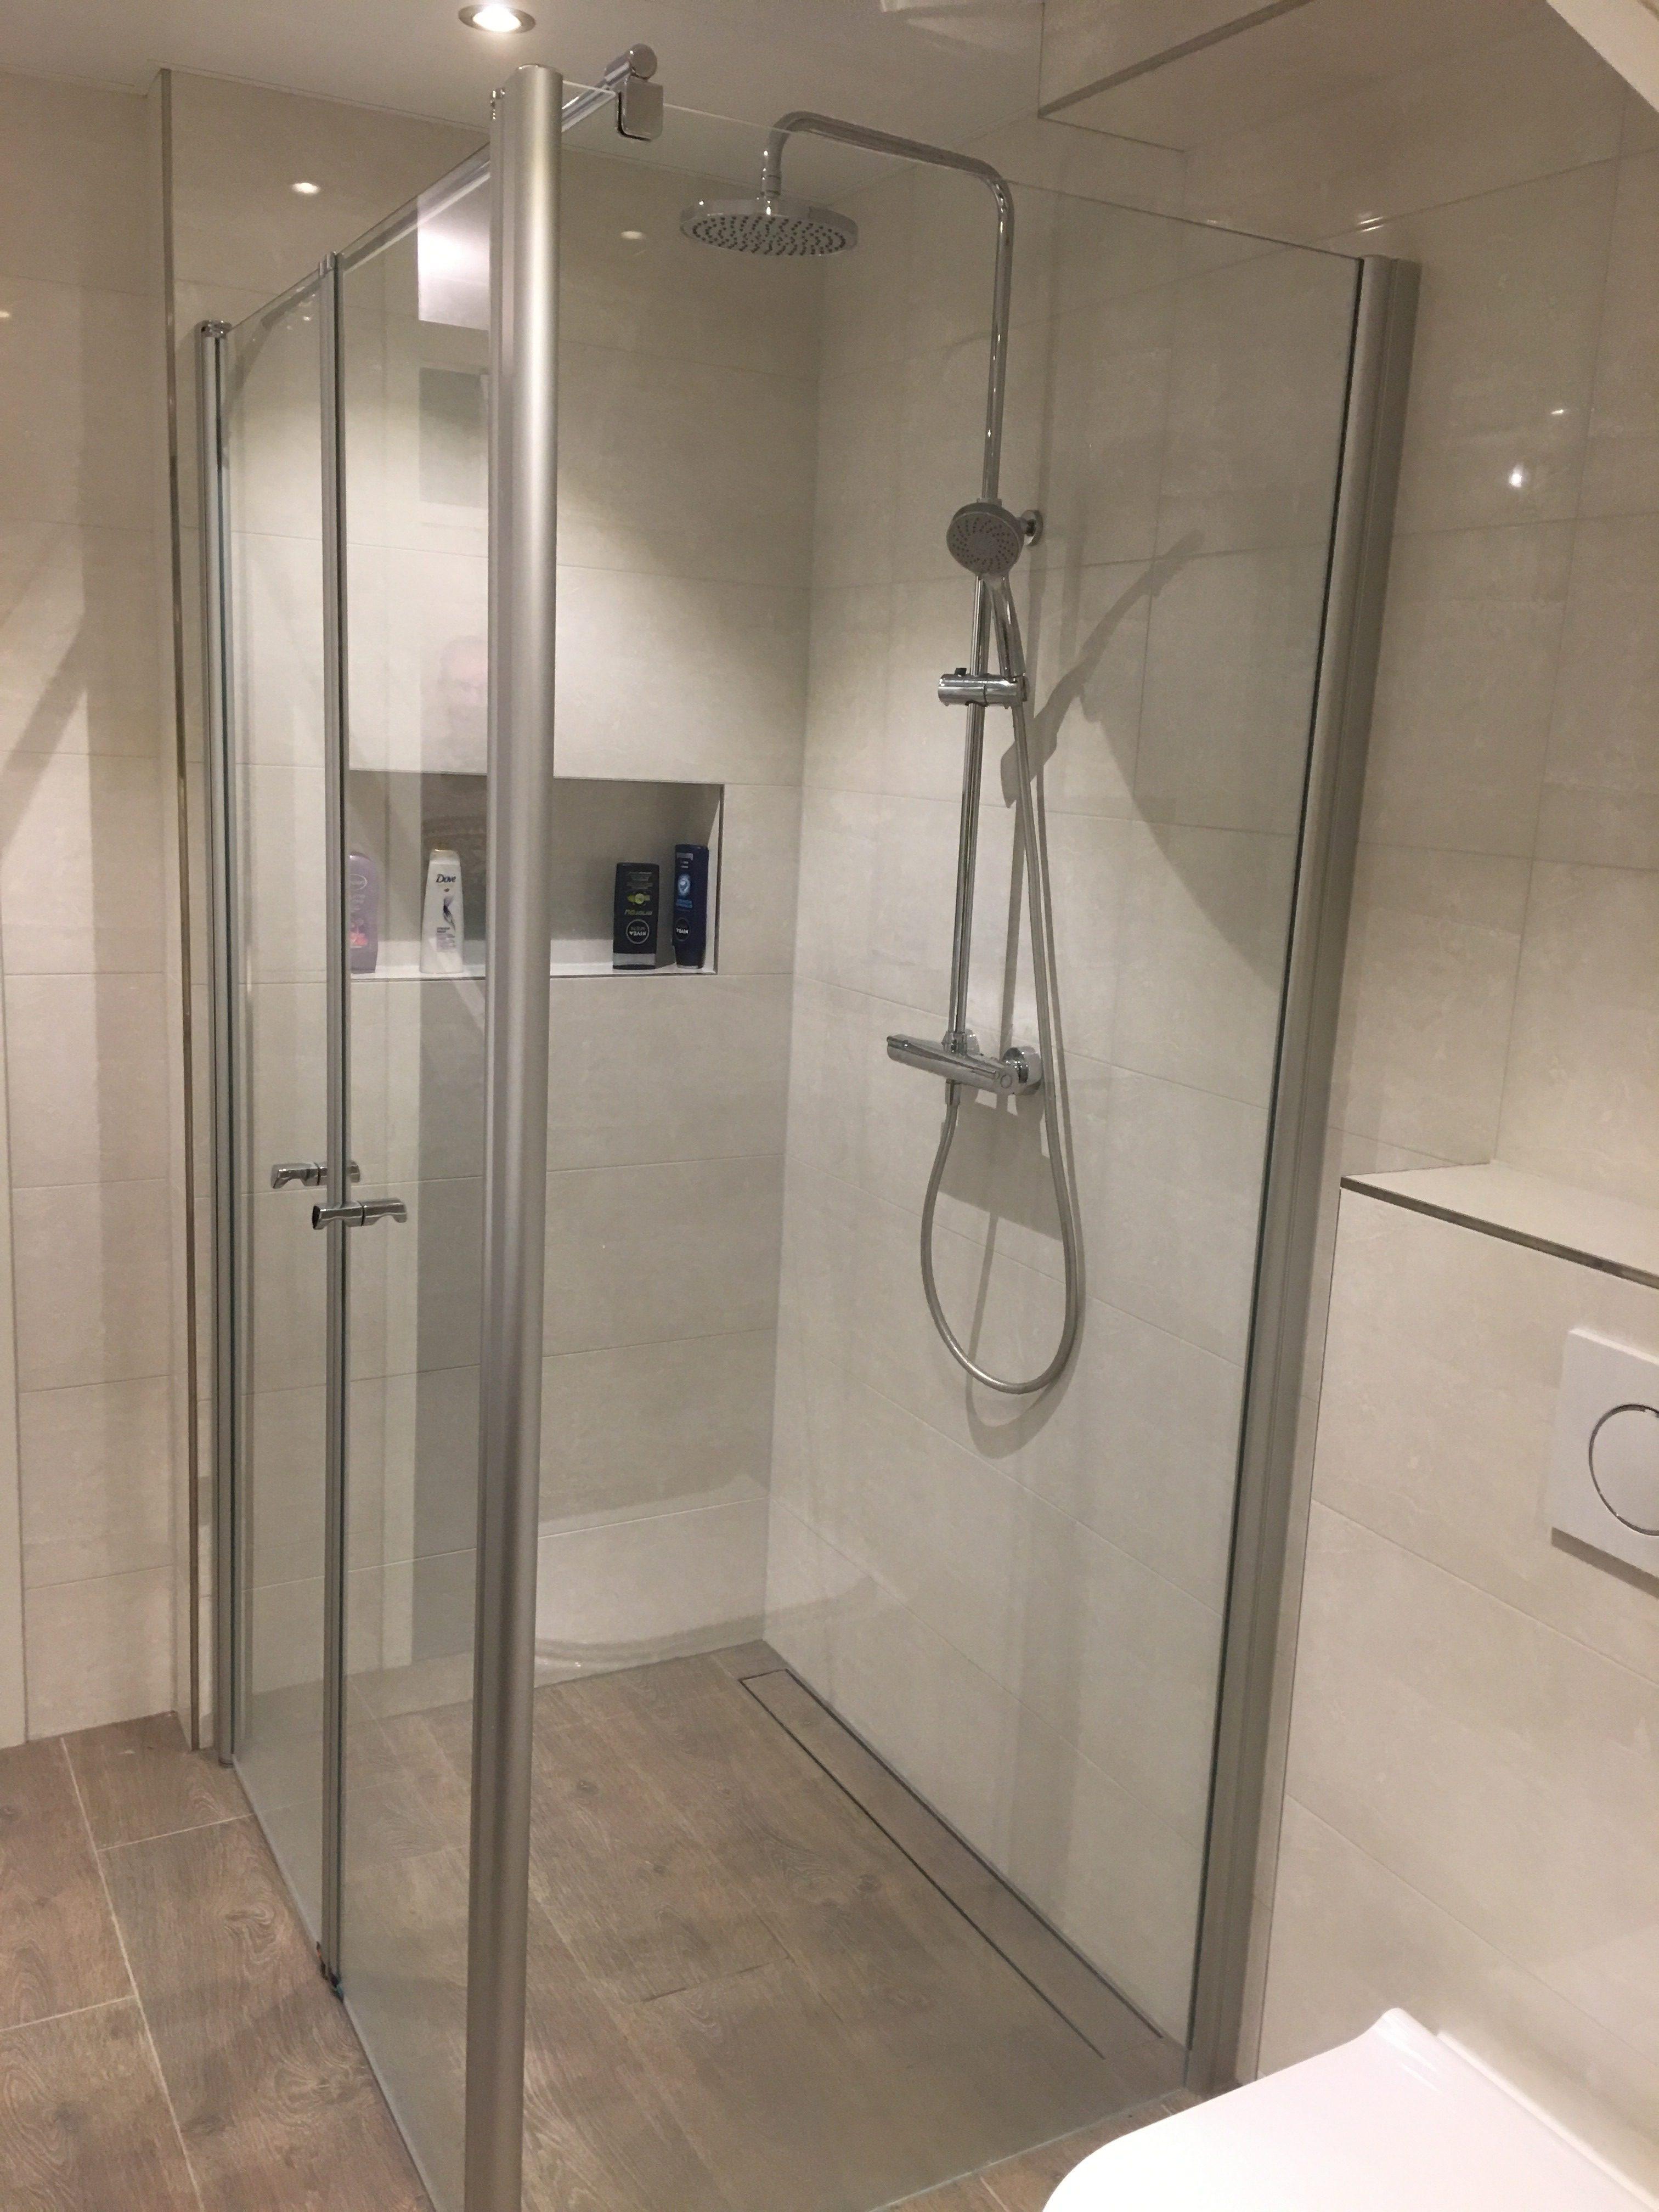 Nieuwe badkamer Ede (zie ook hoe het was) - Wiesenekker ...